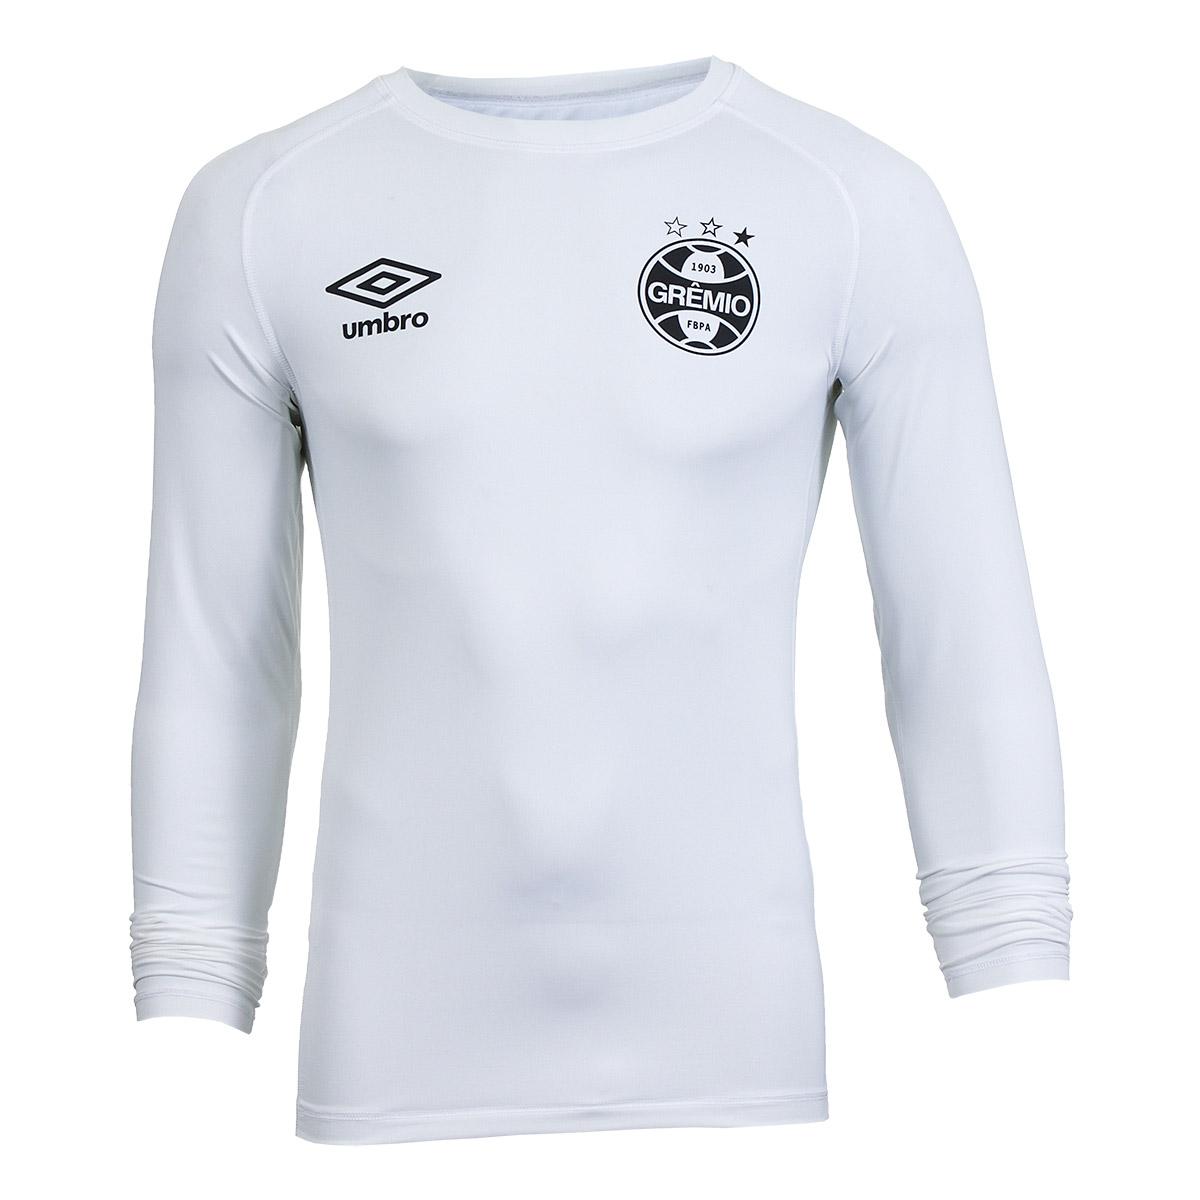 Camiseta Manga Longa Masc. Umbro Termica Gremio 2018 - Branco/Preto